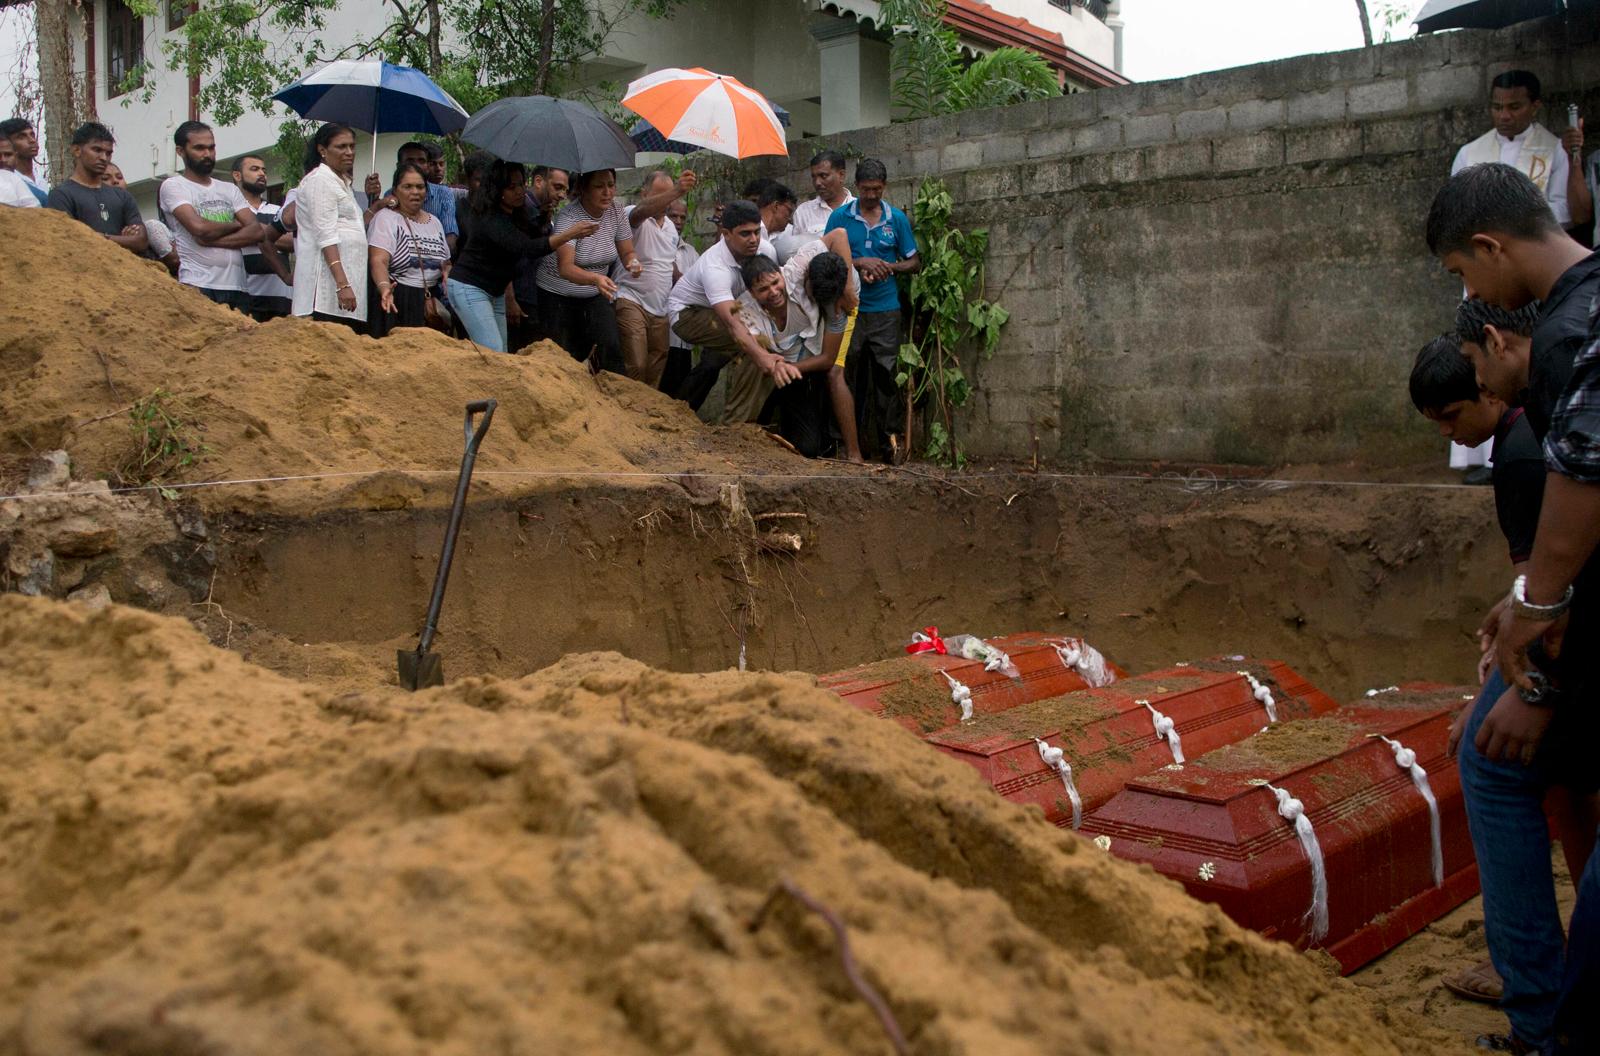 Relatives bury three members of the same family, all died at Easter Sunday bomb blast at St. Sebastian Church in Negombo, Sri Lanka, Monday, April 22, 2019. AP